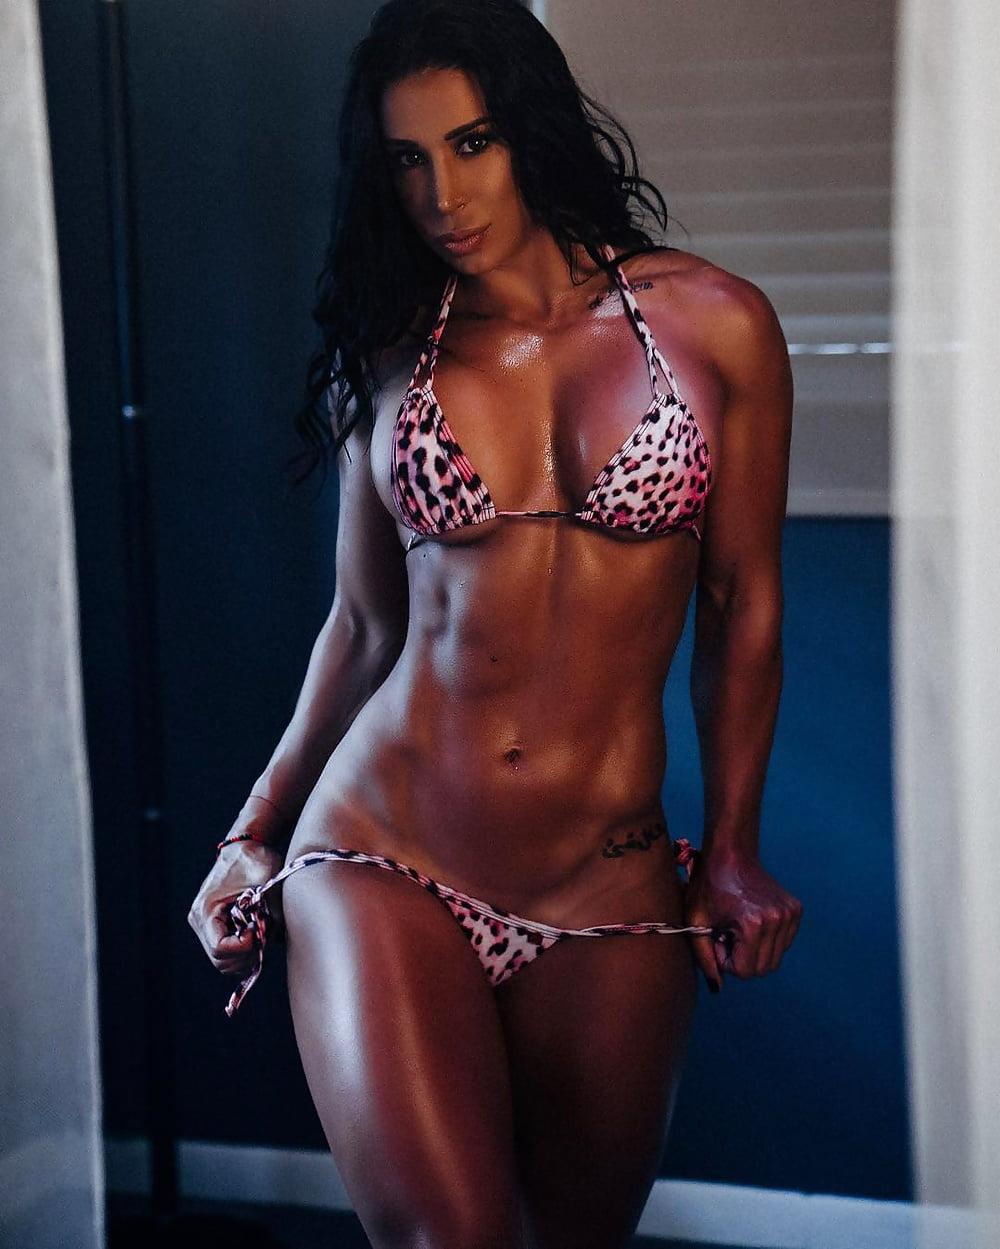 Ophilia female fitness model, nude jennifer smith